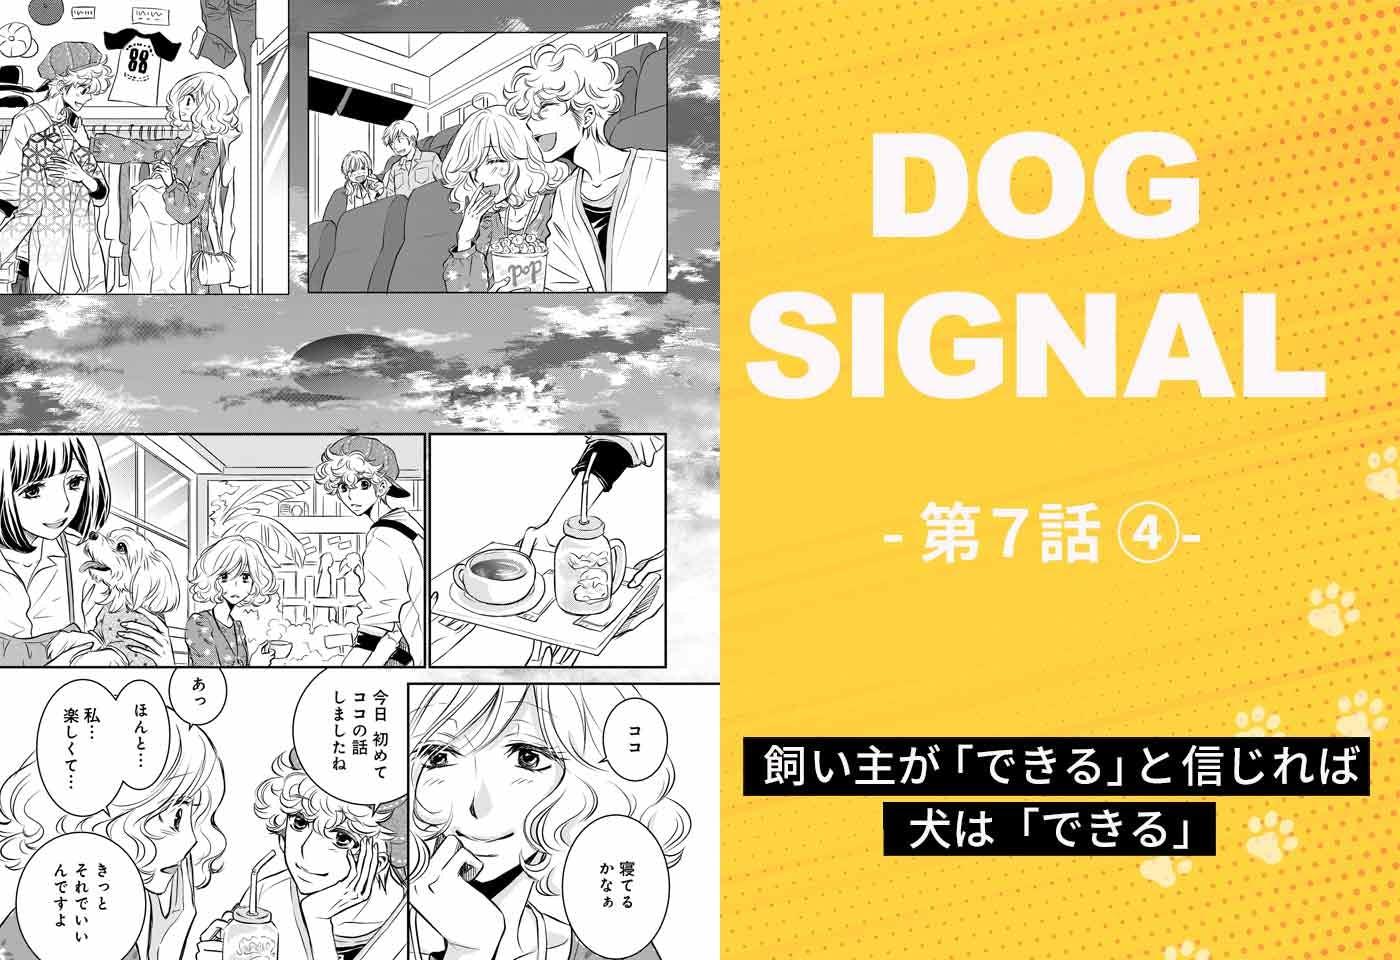 『DOG SIGNAL』7話目 4/4